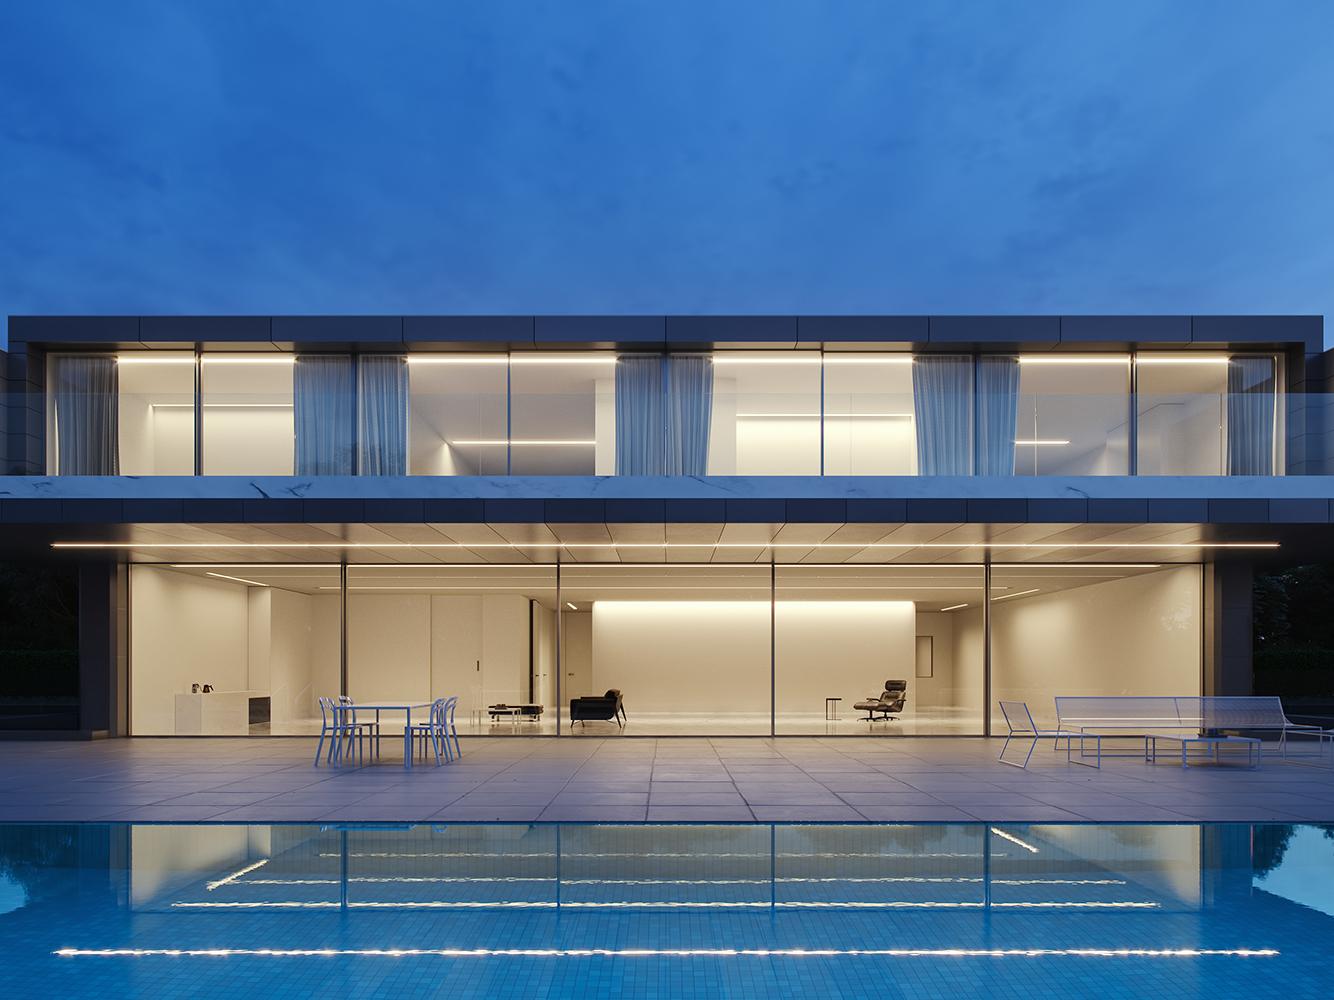 La Casa del Aluminio design archviz architecture visualization coronarender cg art cg cgi render build exterior design exterior